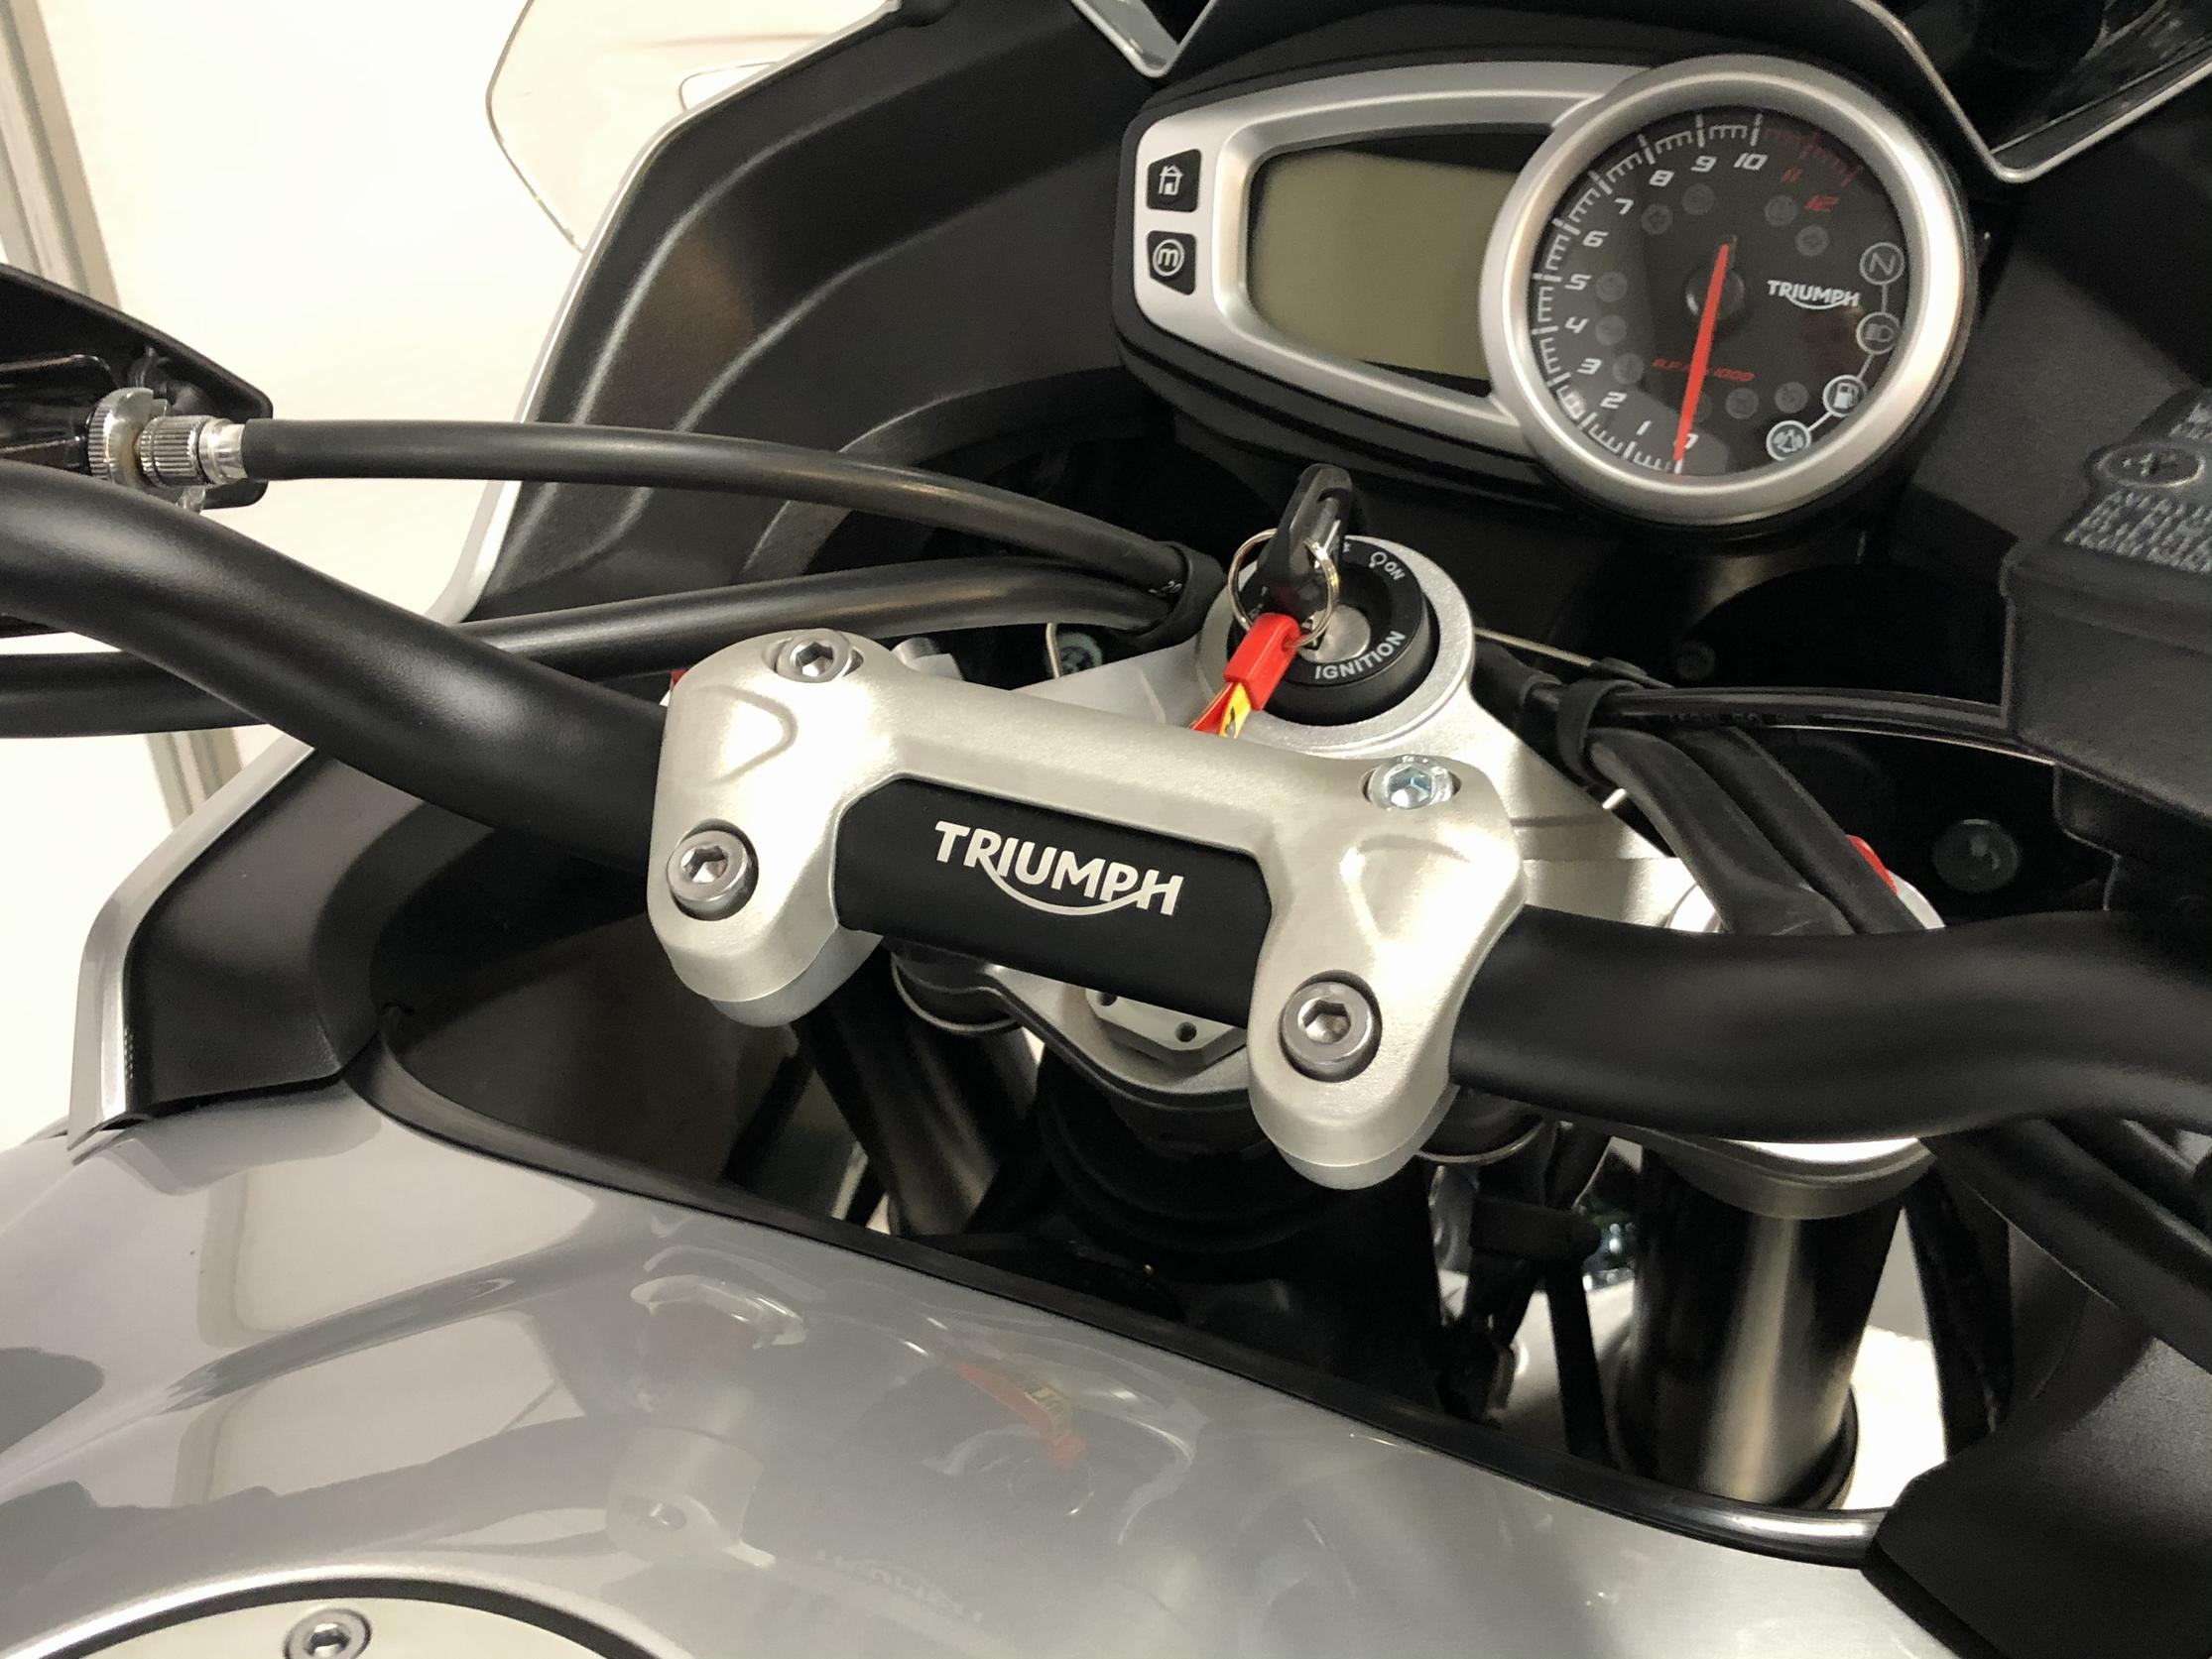 TRIUMPH - TIGER 1050 ABS